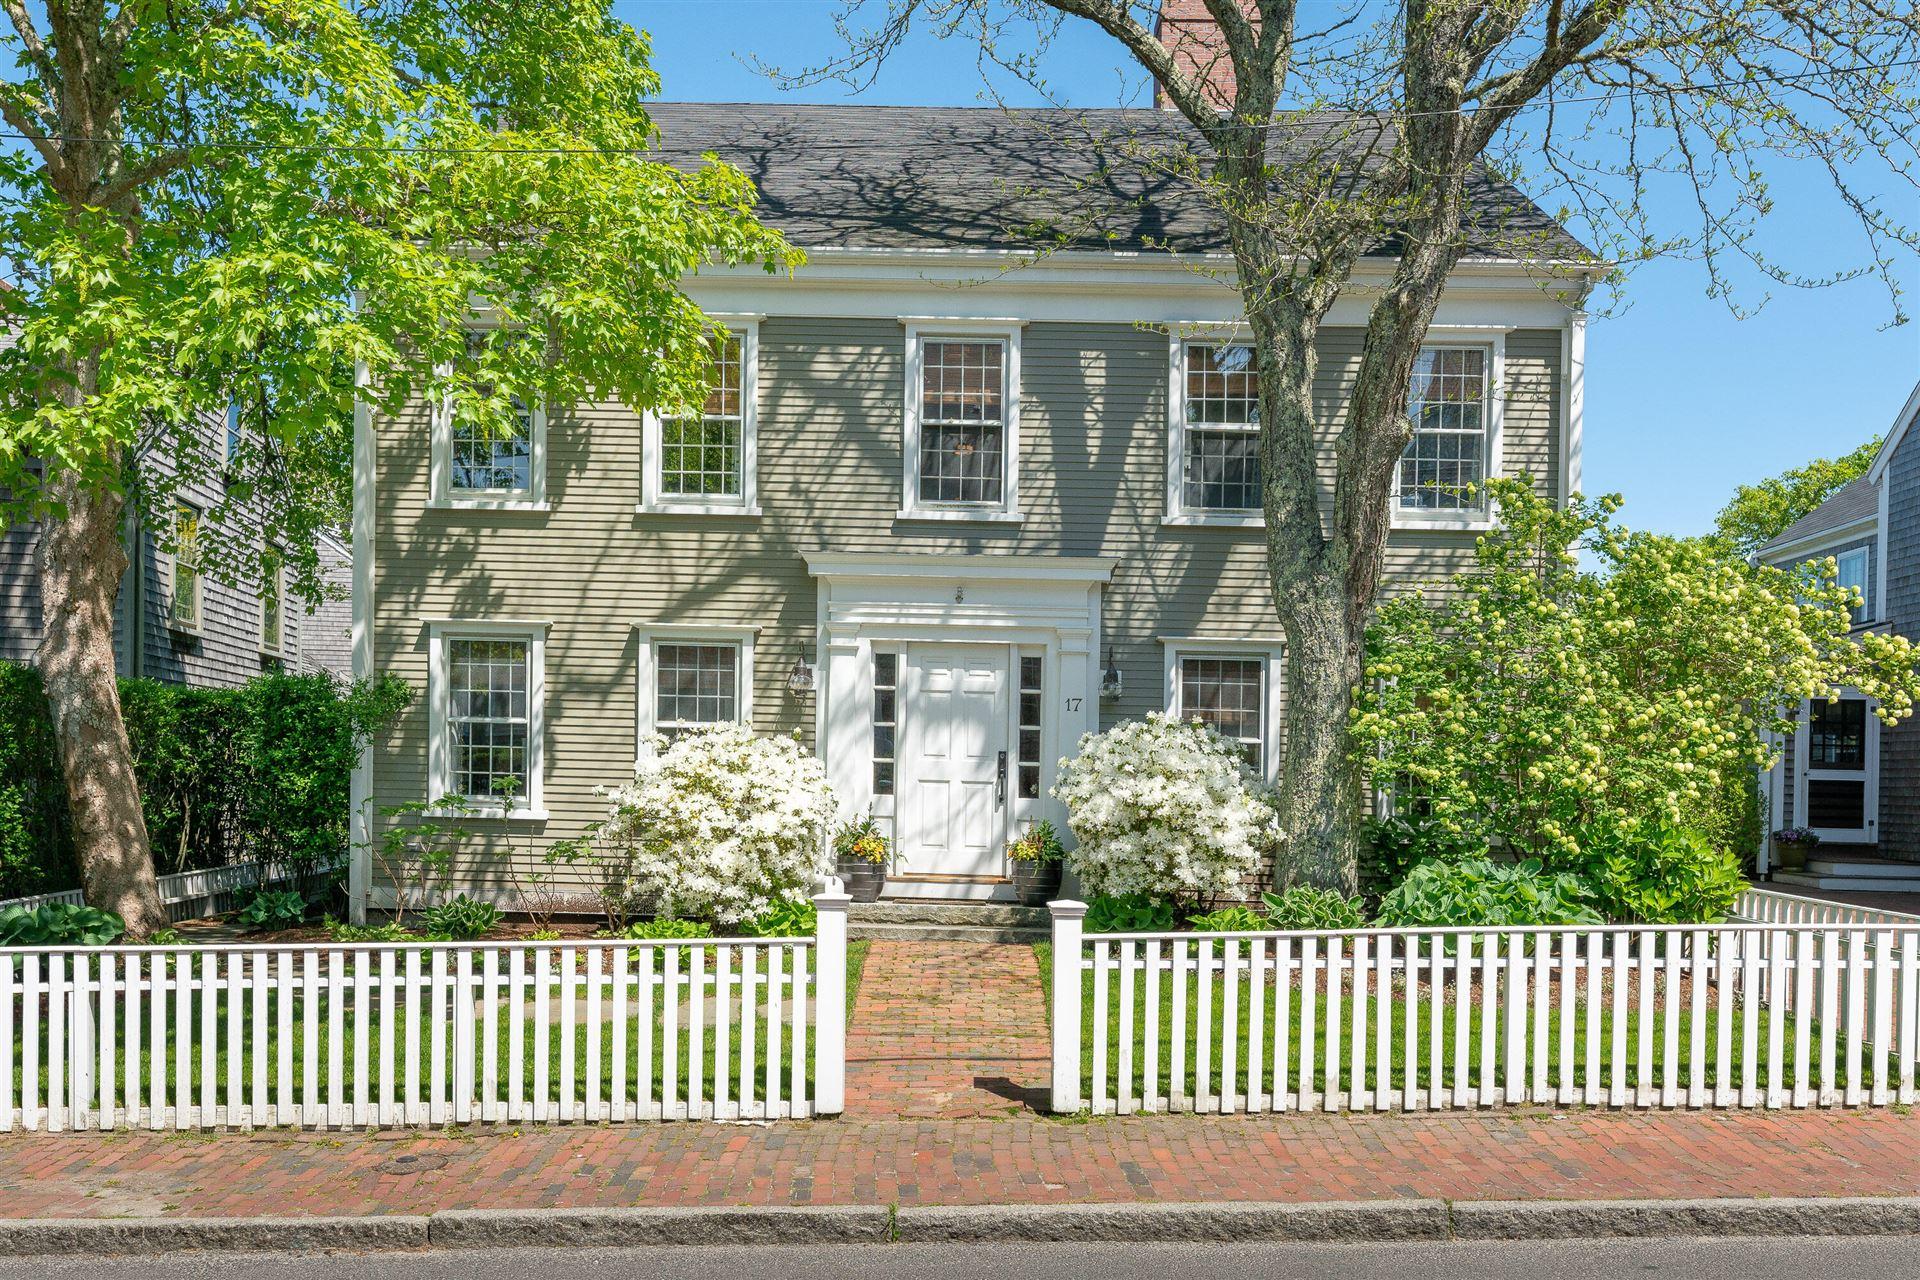 Photo of 17 Gardner Street, Nantucket, MA 02554 (MLS # 22103462)